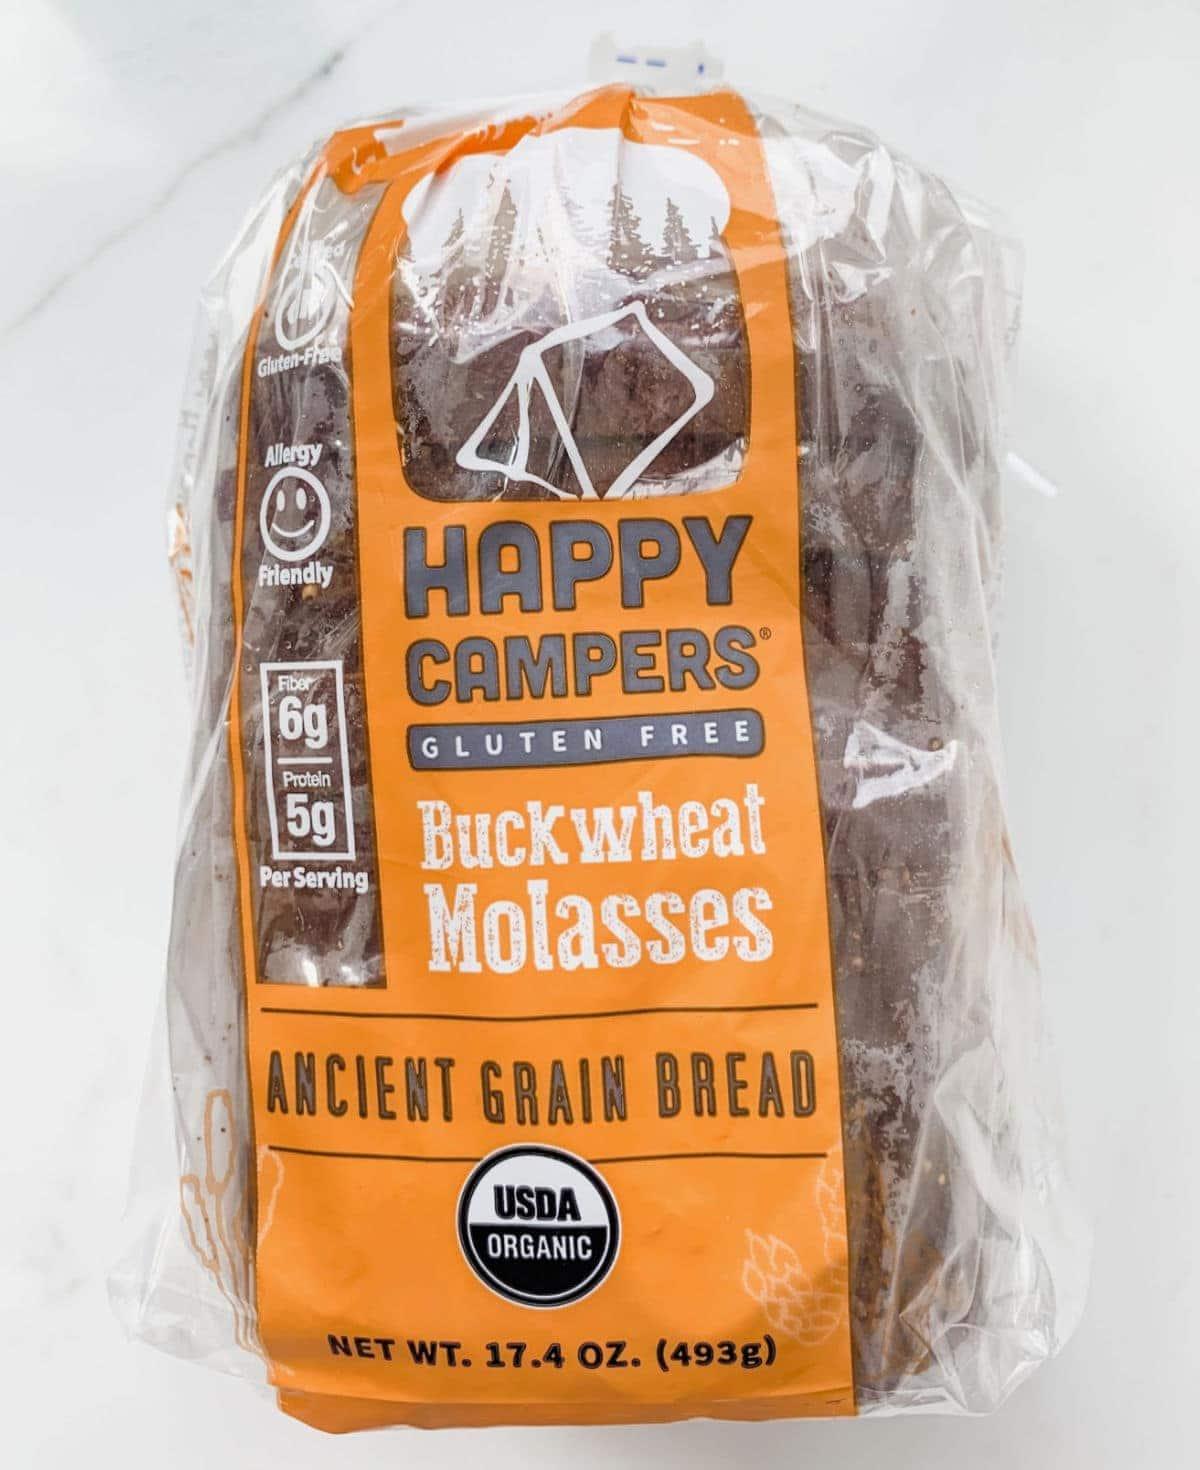 Happy Campers gluten free buckwheat molasses bread.